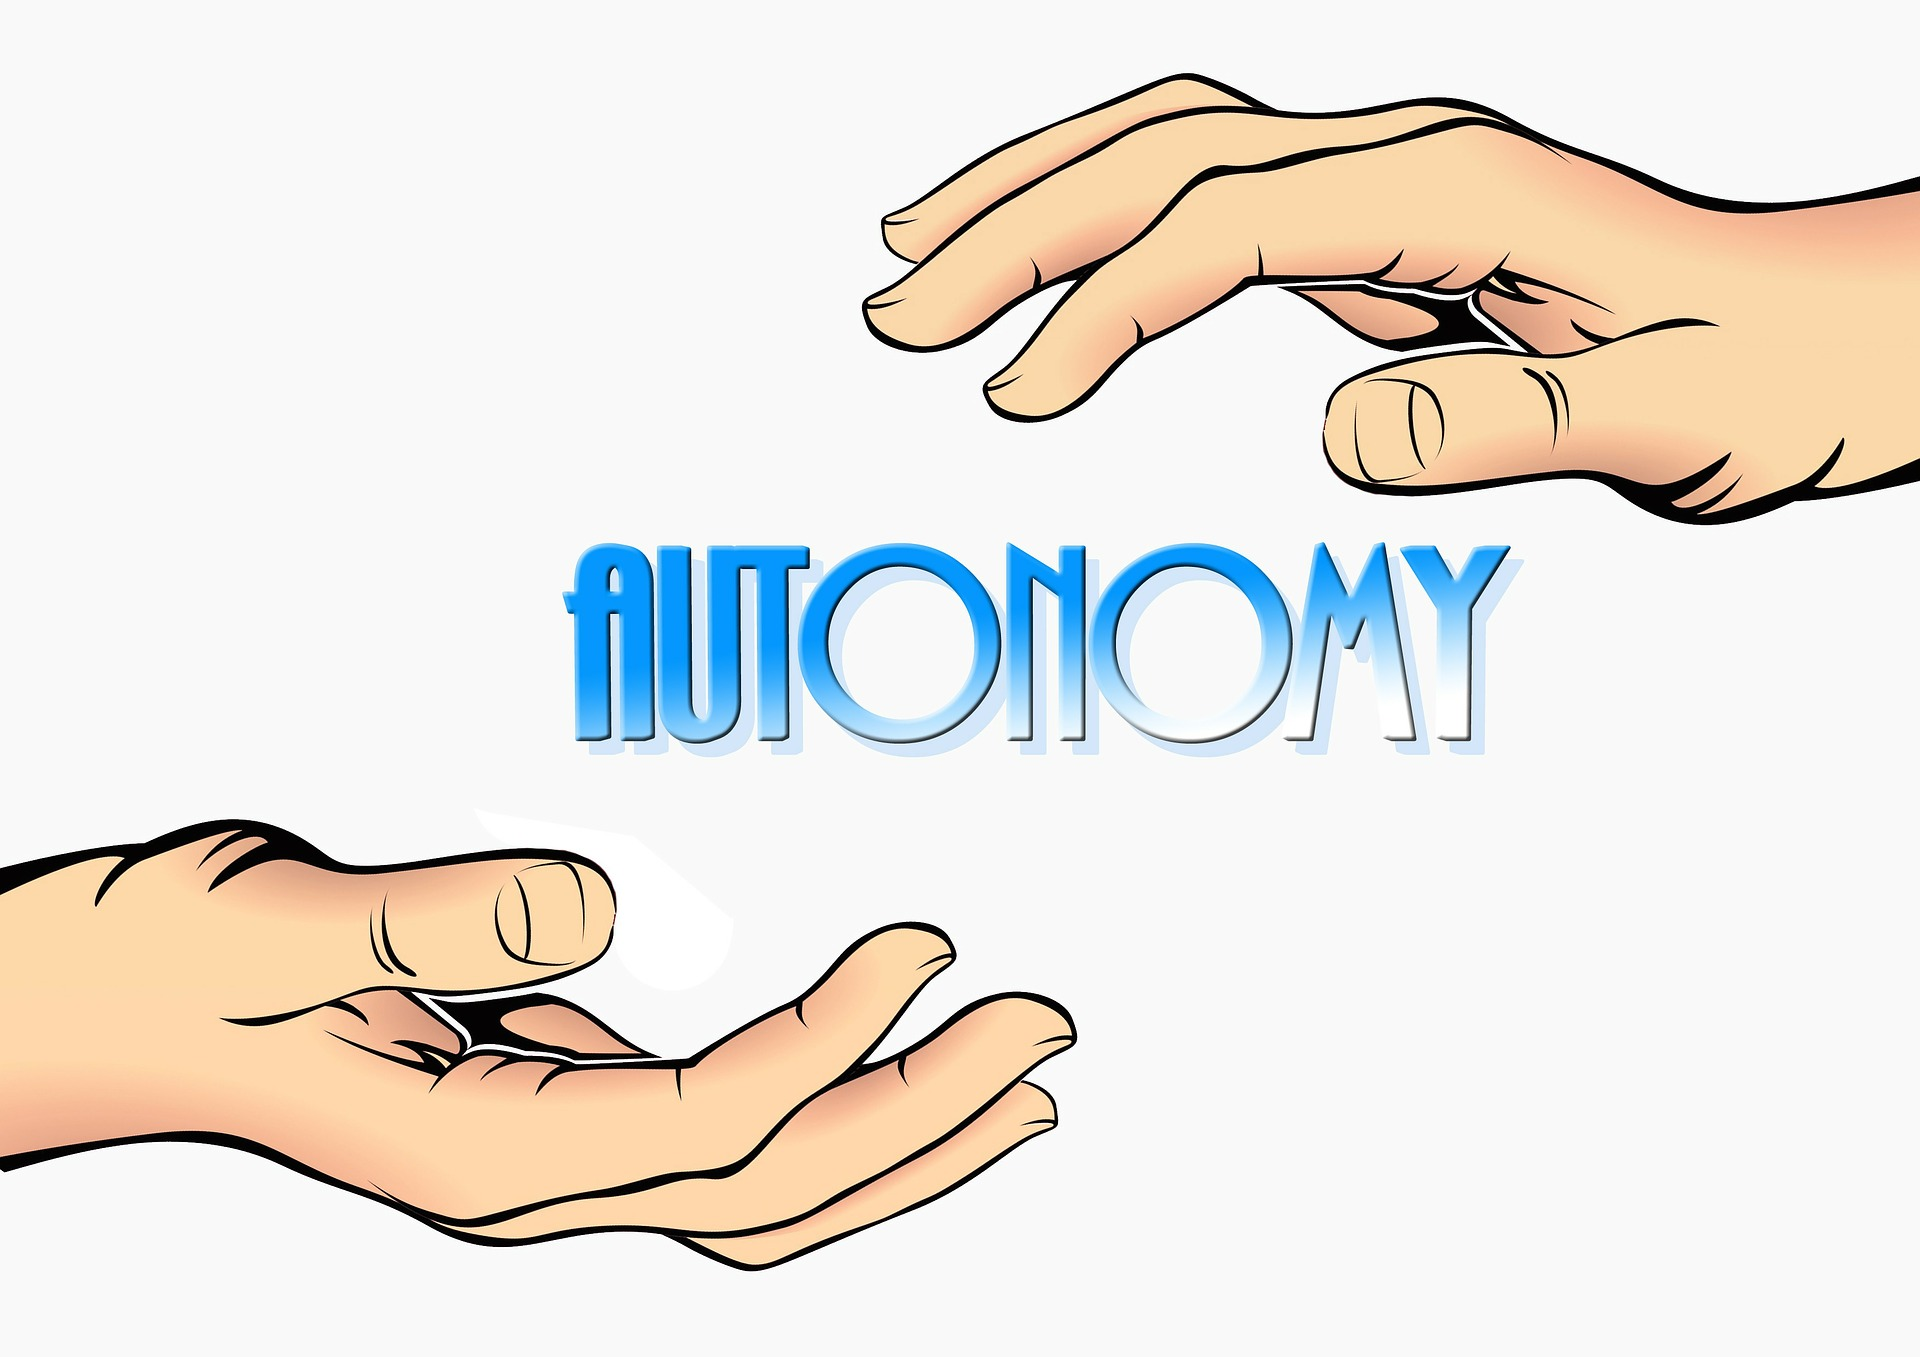 principio-autonomia